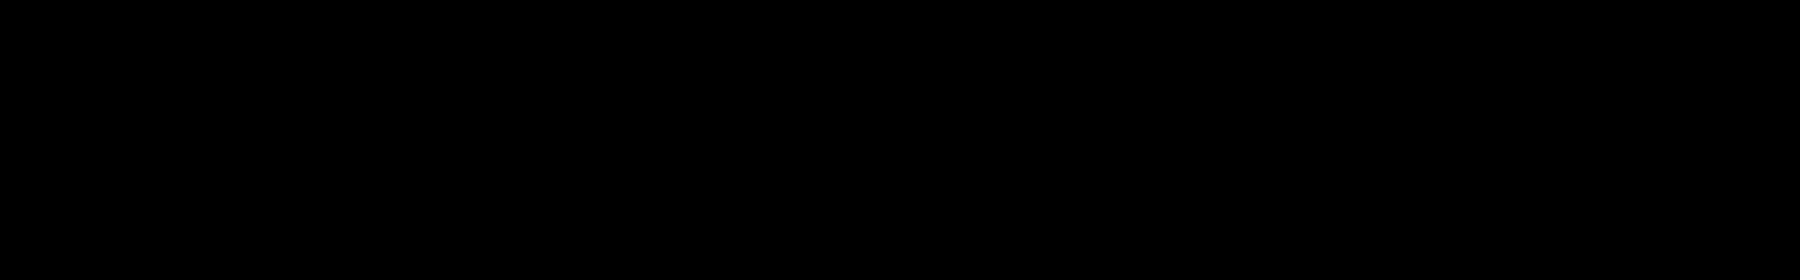 Subhertz - Deep & Dark Dubstep audio waveform